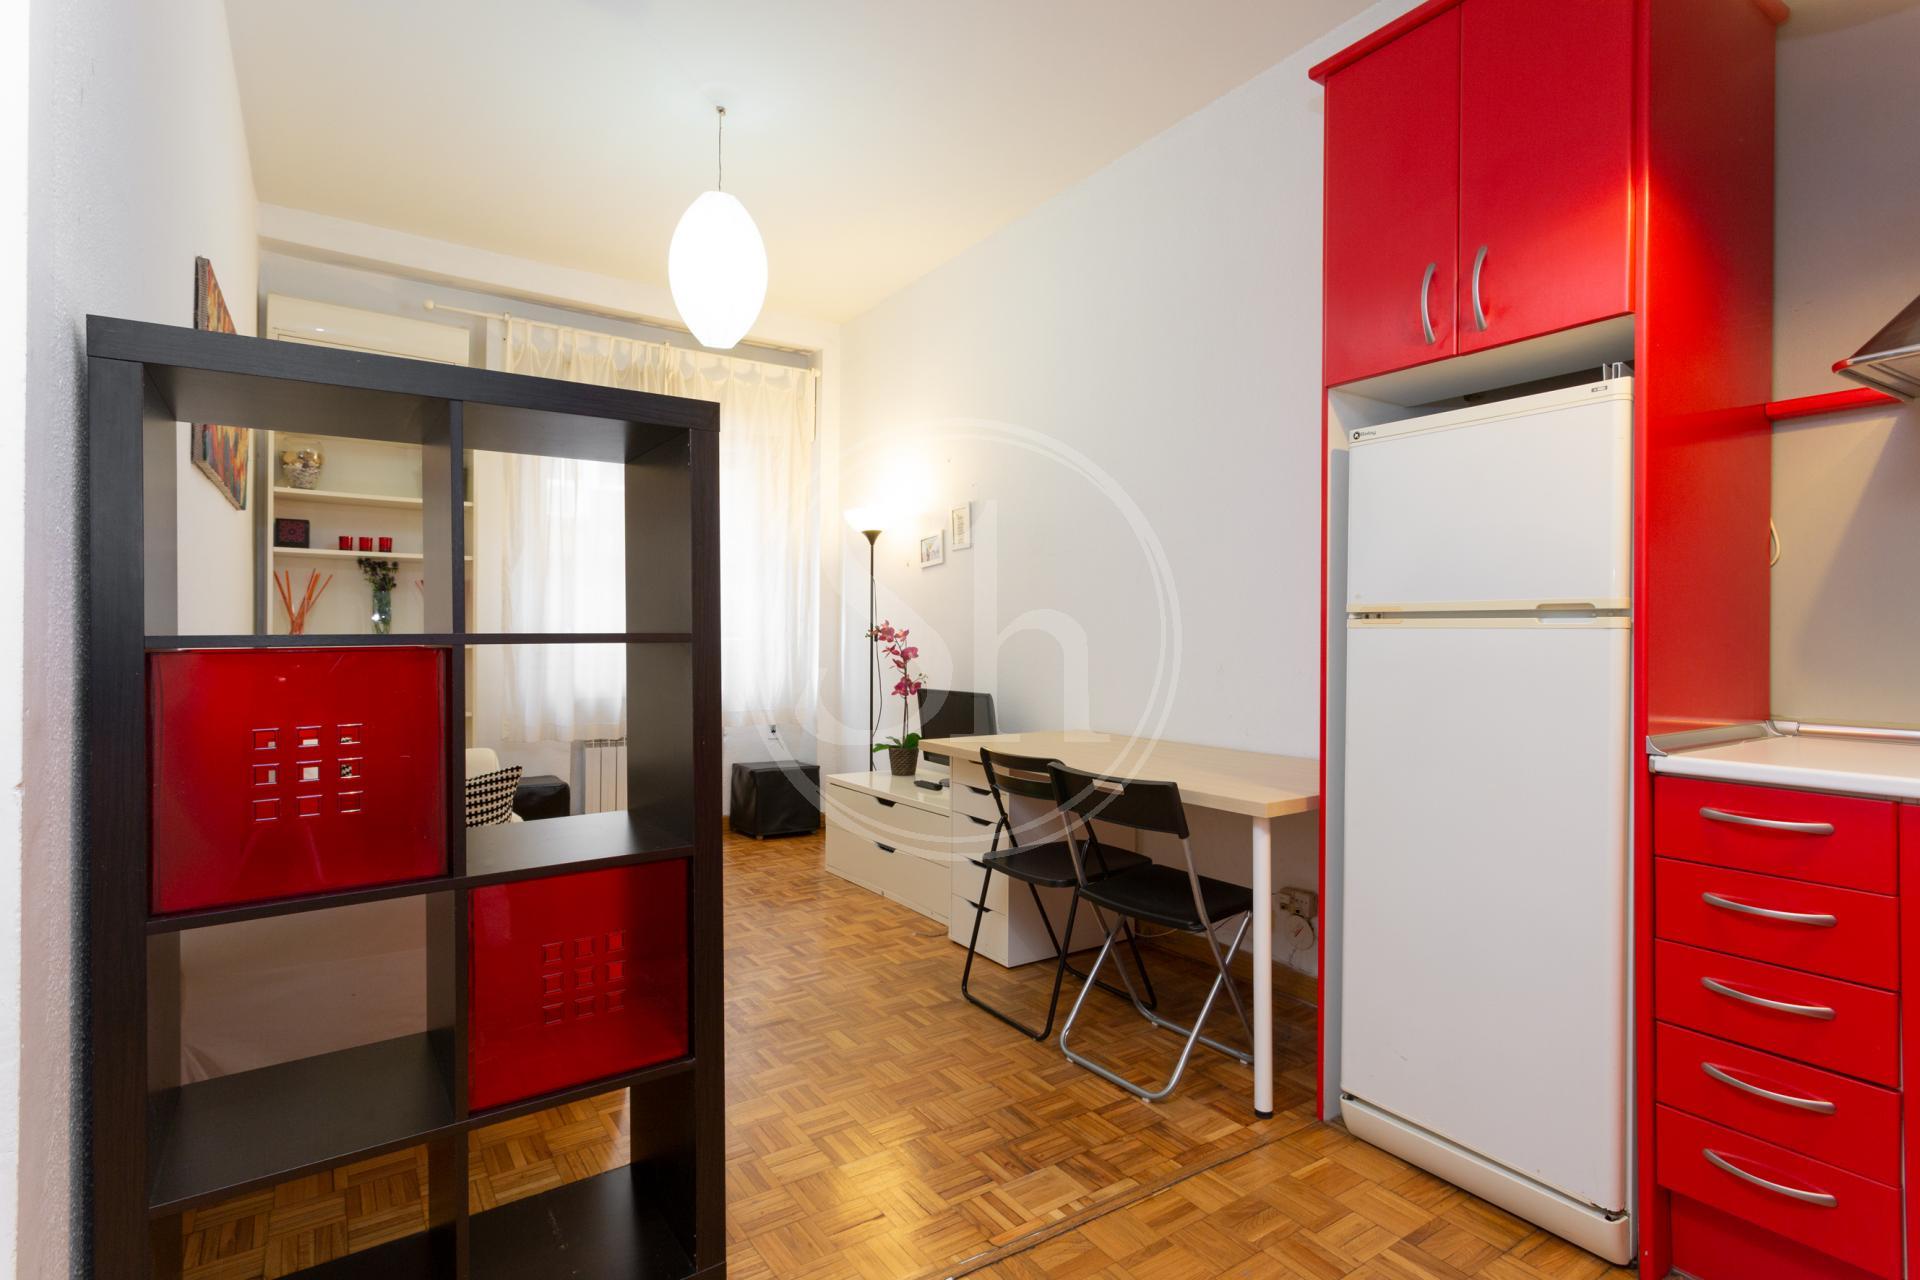 Квартира в аренду в Barcelona Alacant - Ganduxer (special Conditions)